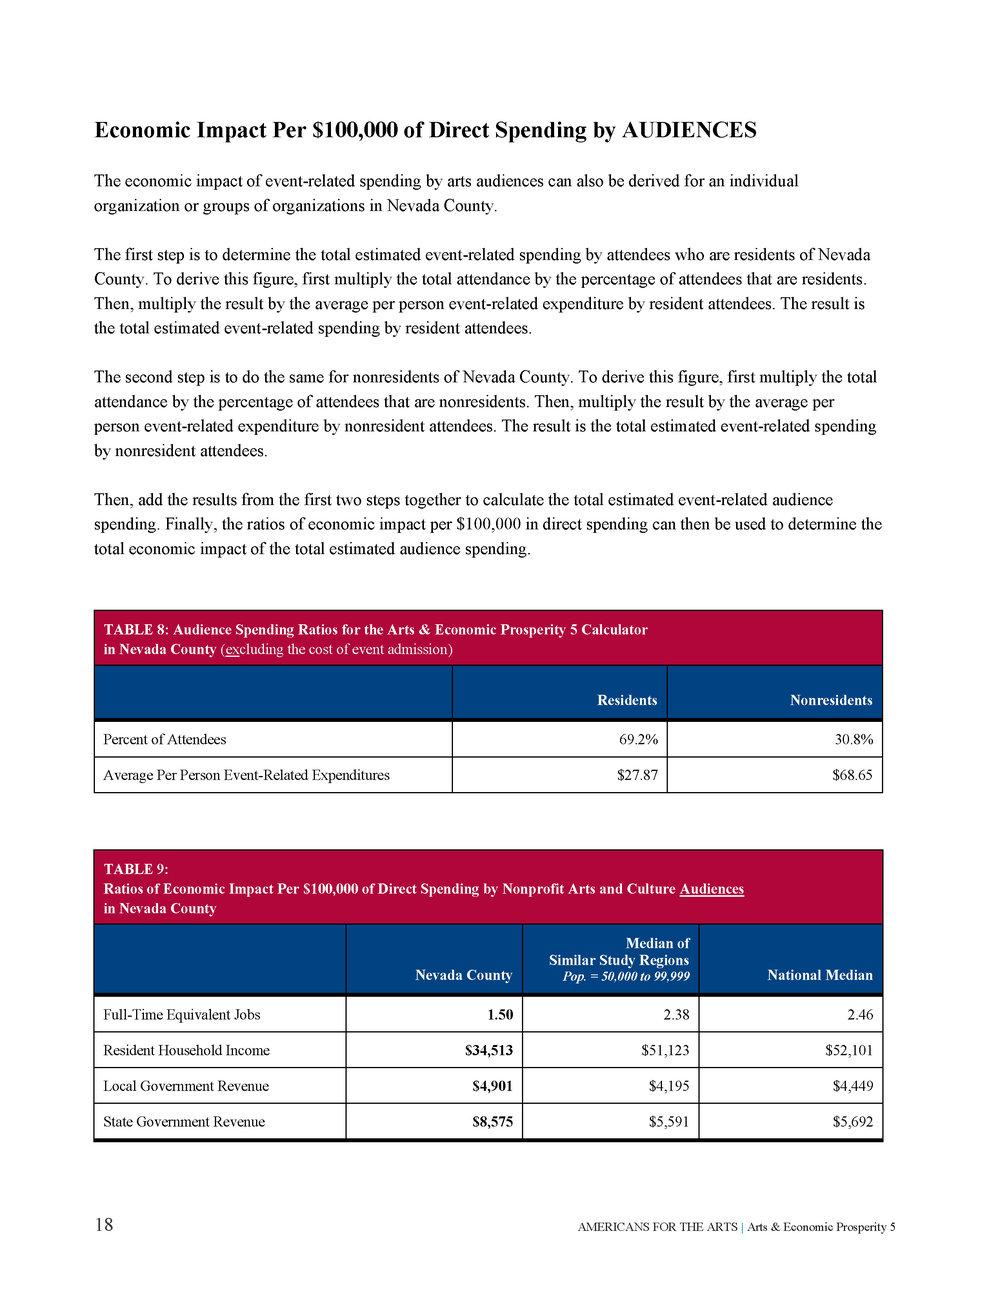 Arts & Economic Prosperity in Nevada County_Page_22.jpg